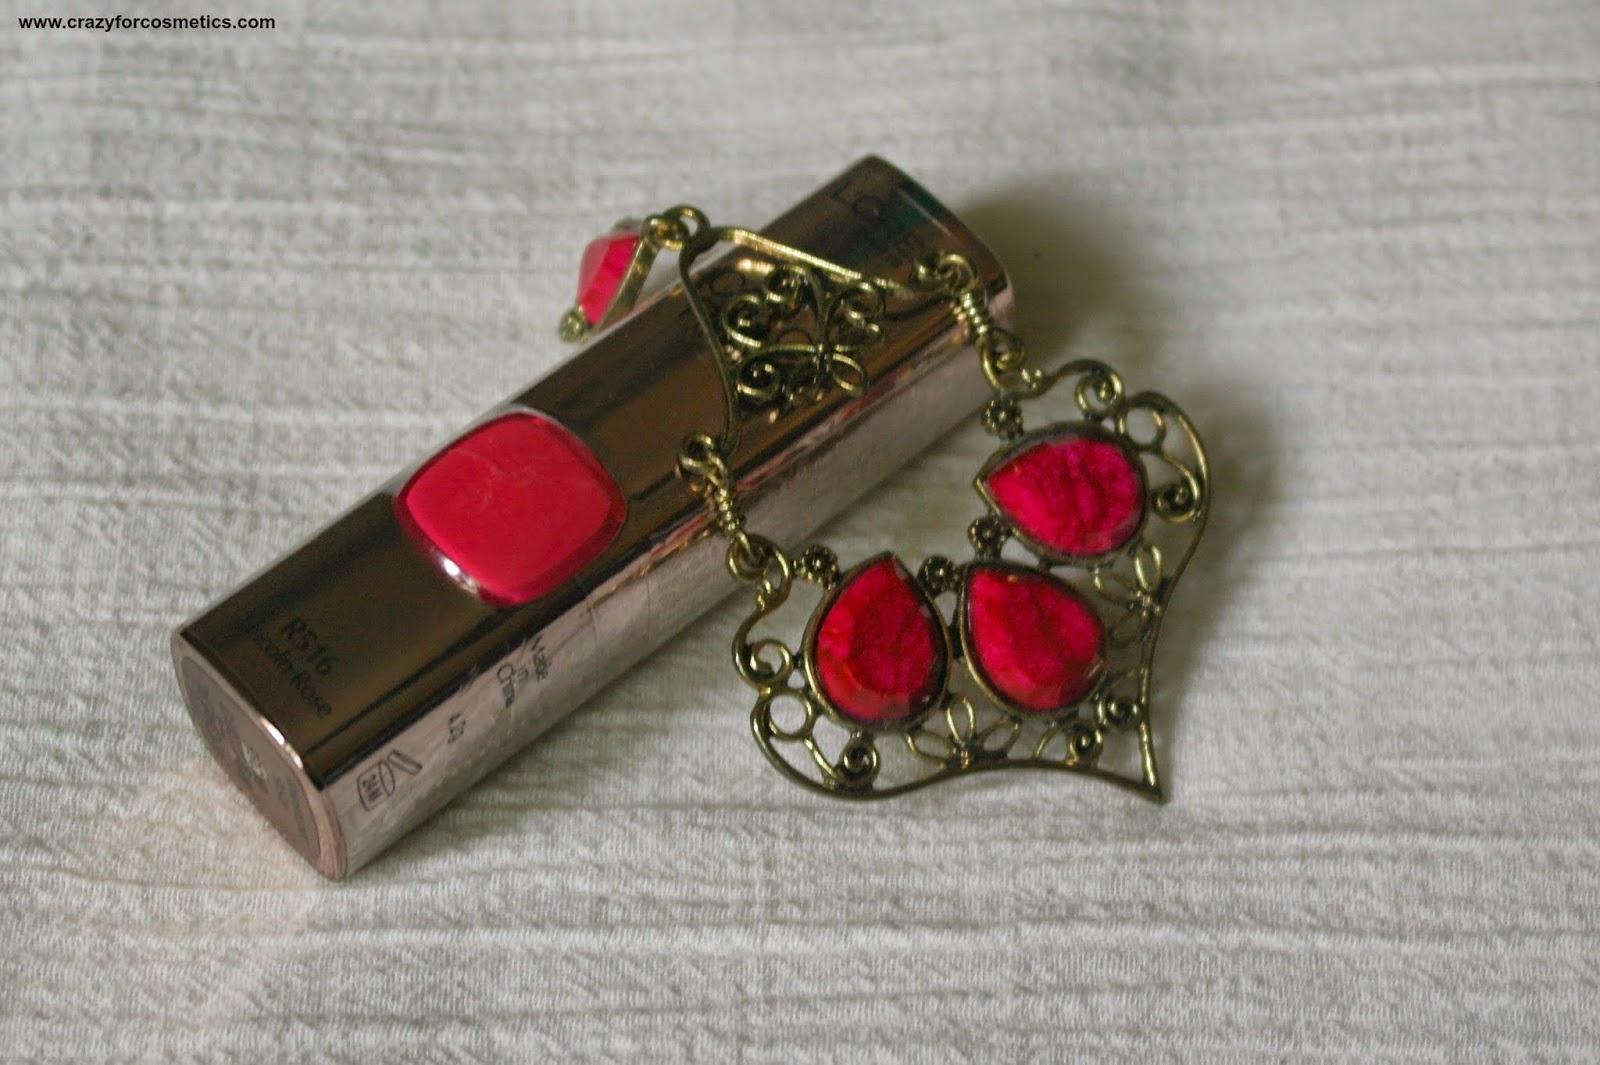 Loreal Moist Matte Lincoln rose lipstick Aishwarya rai cannes lipstick